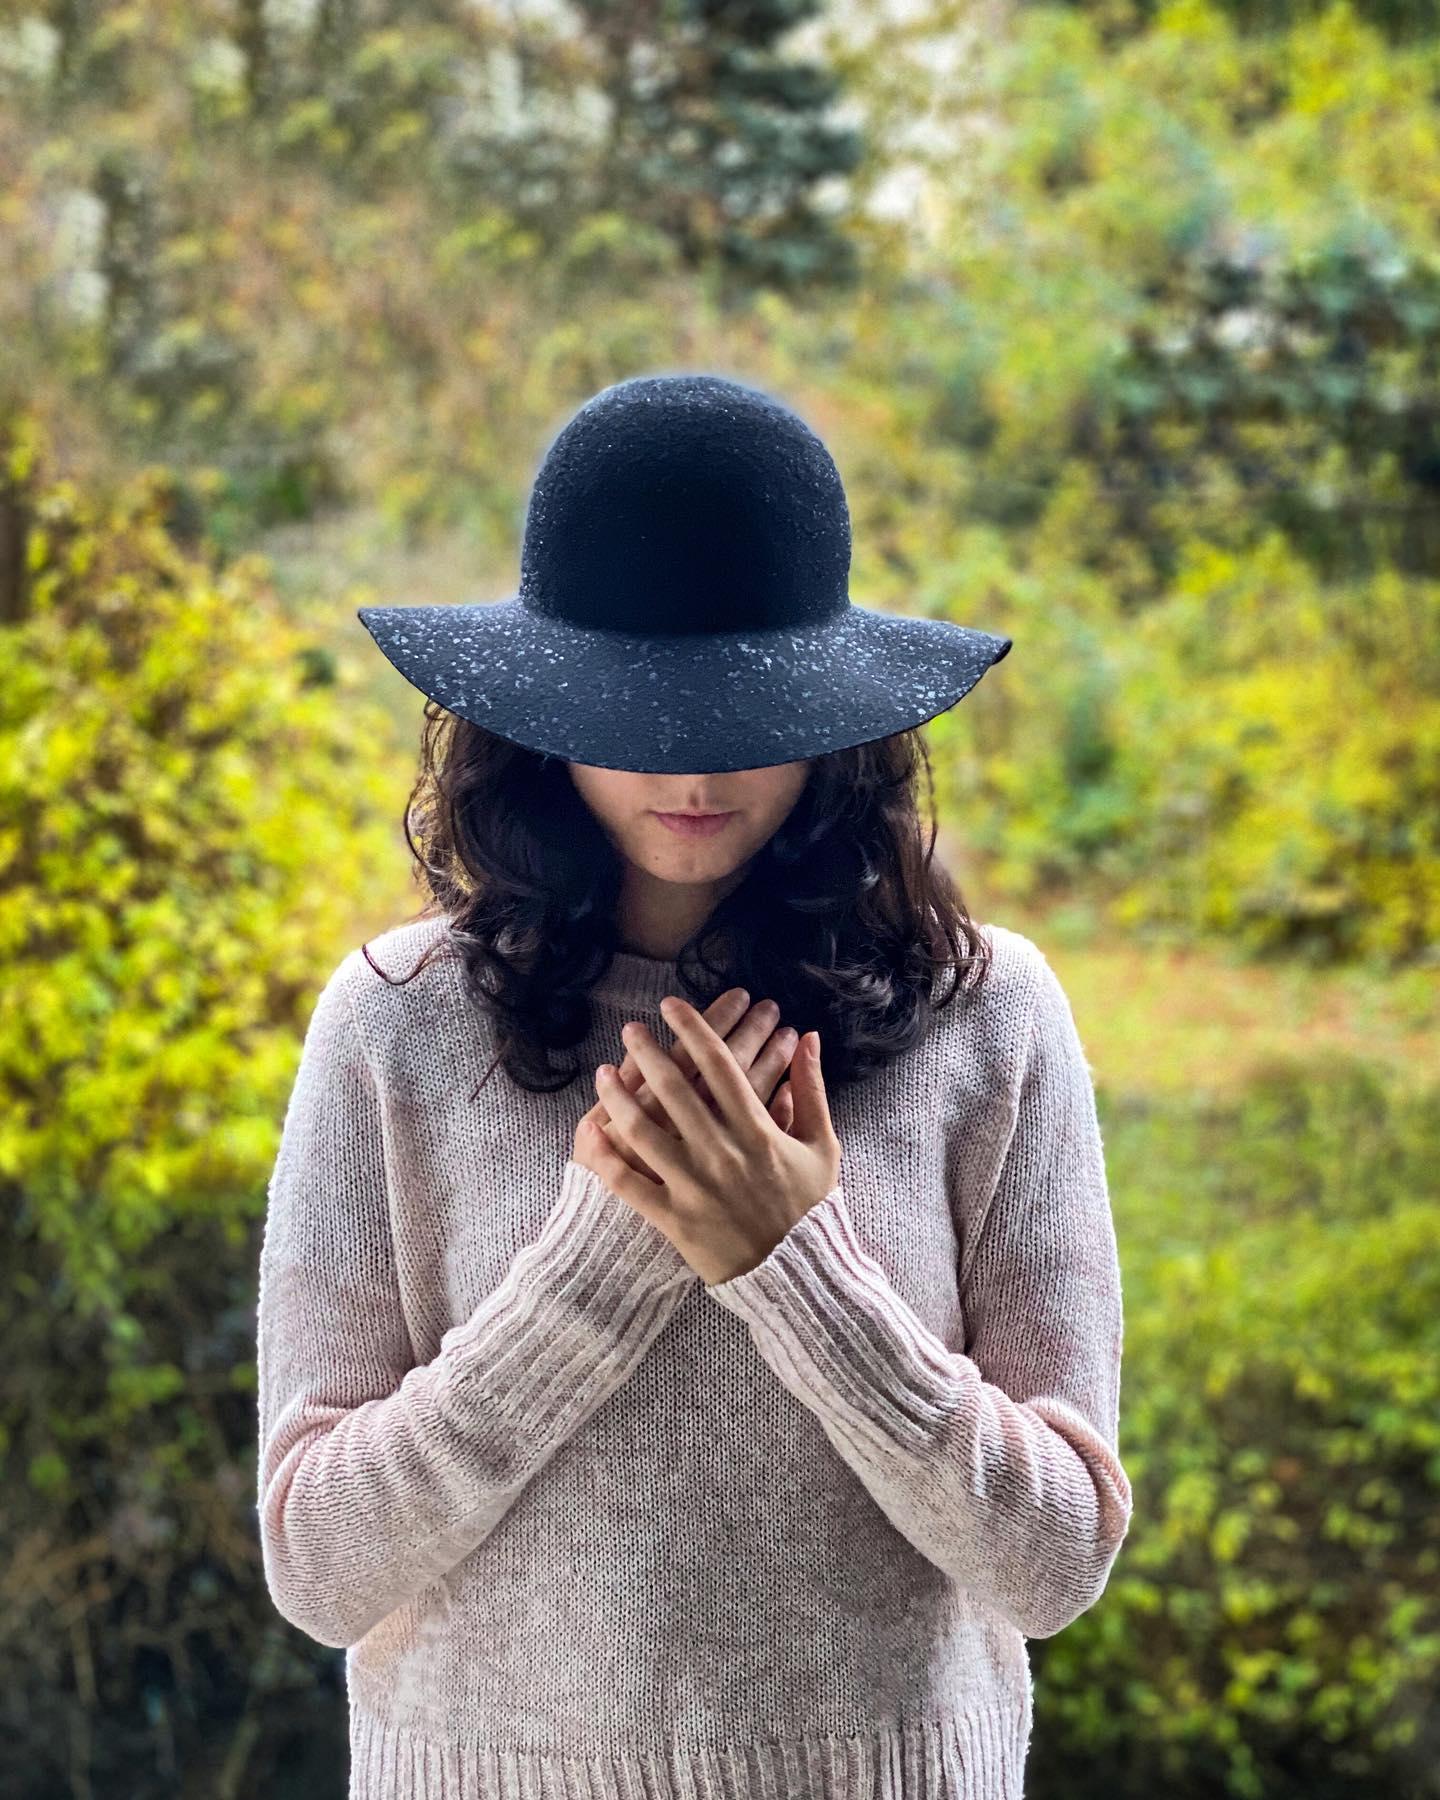 Effect of gratitude on the brain